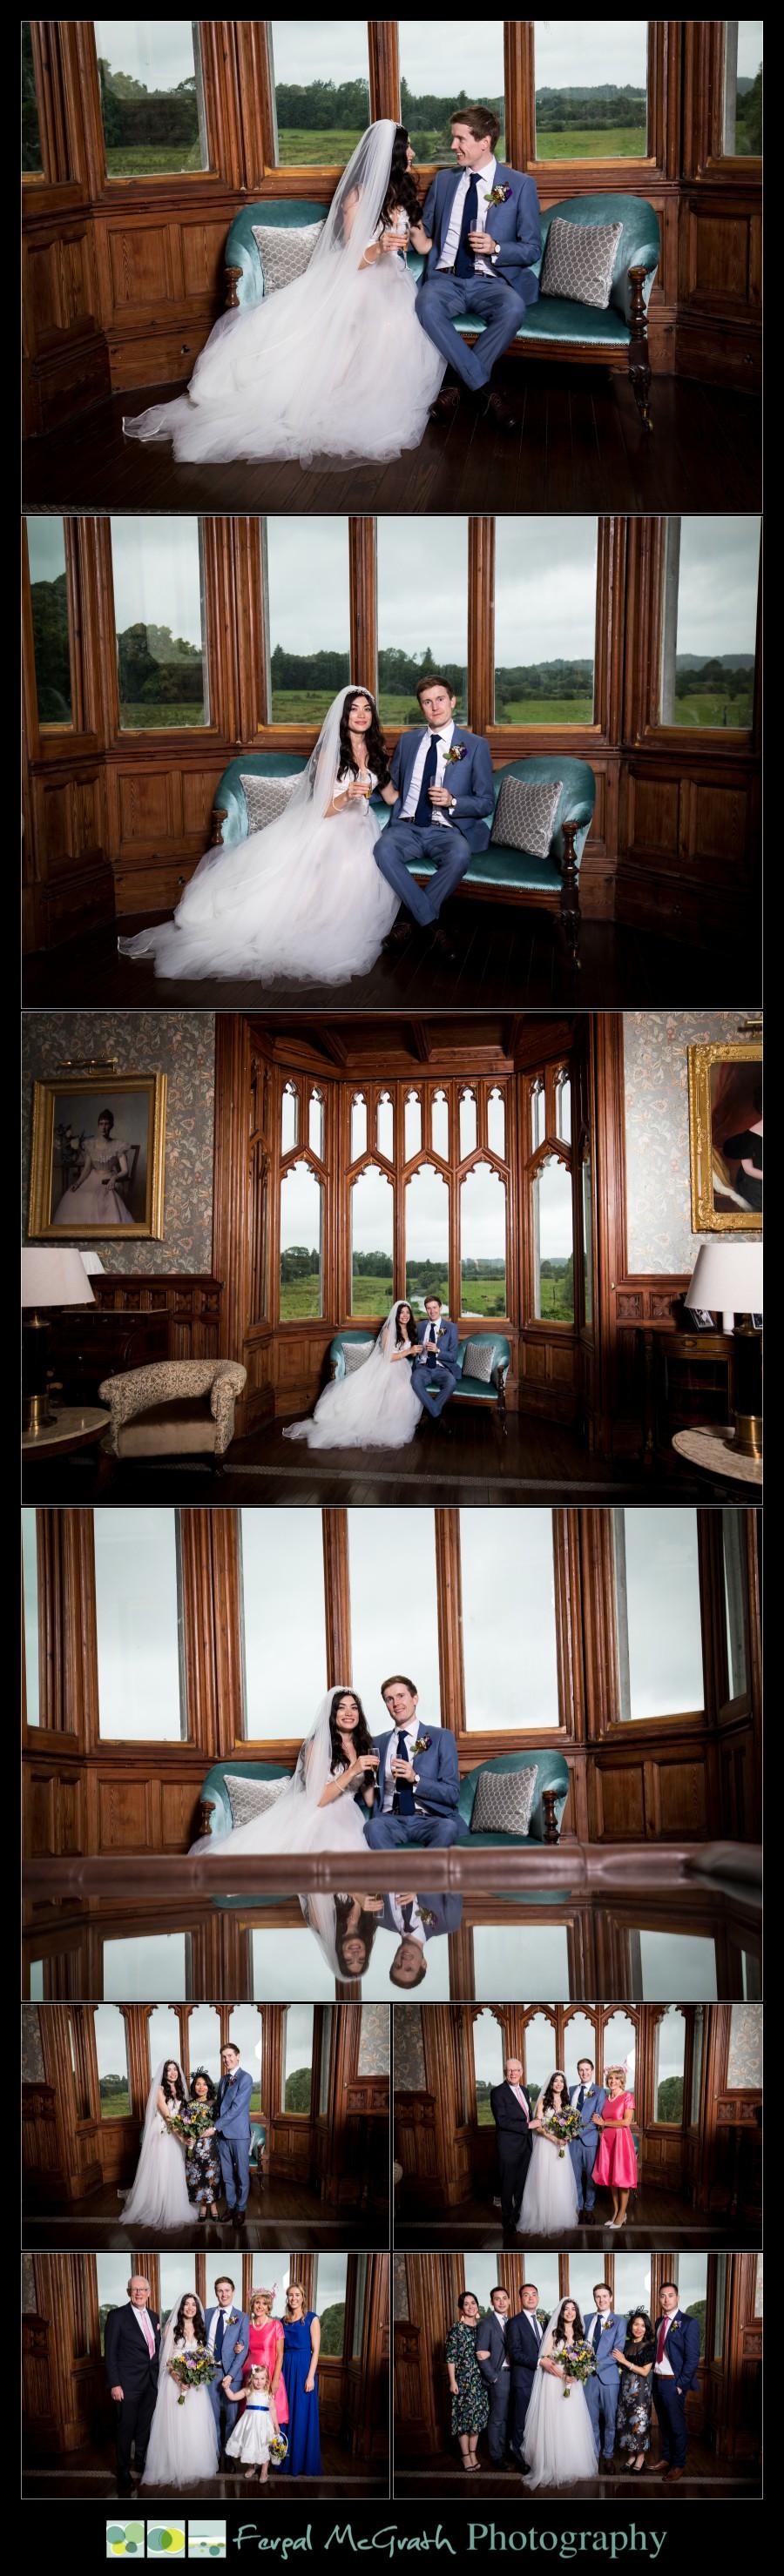 Markree Castle Wedding photos inside the castle